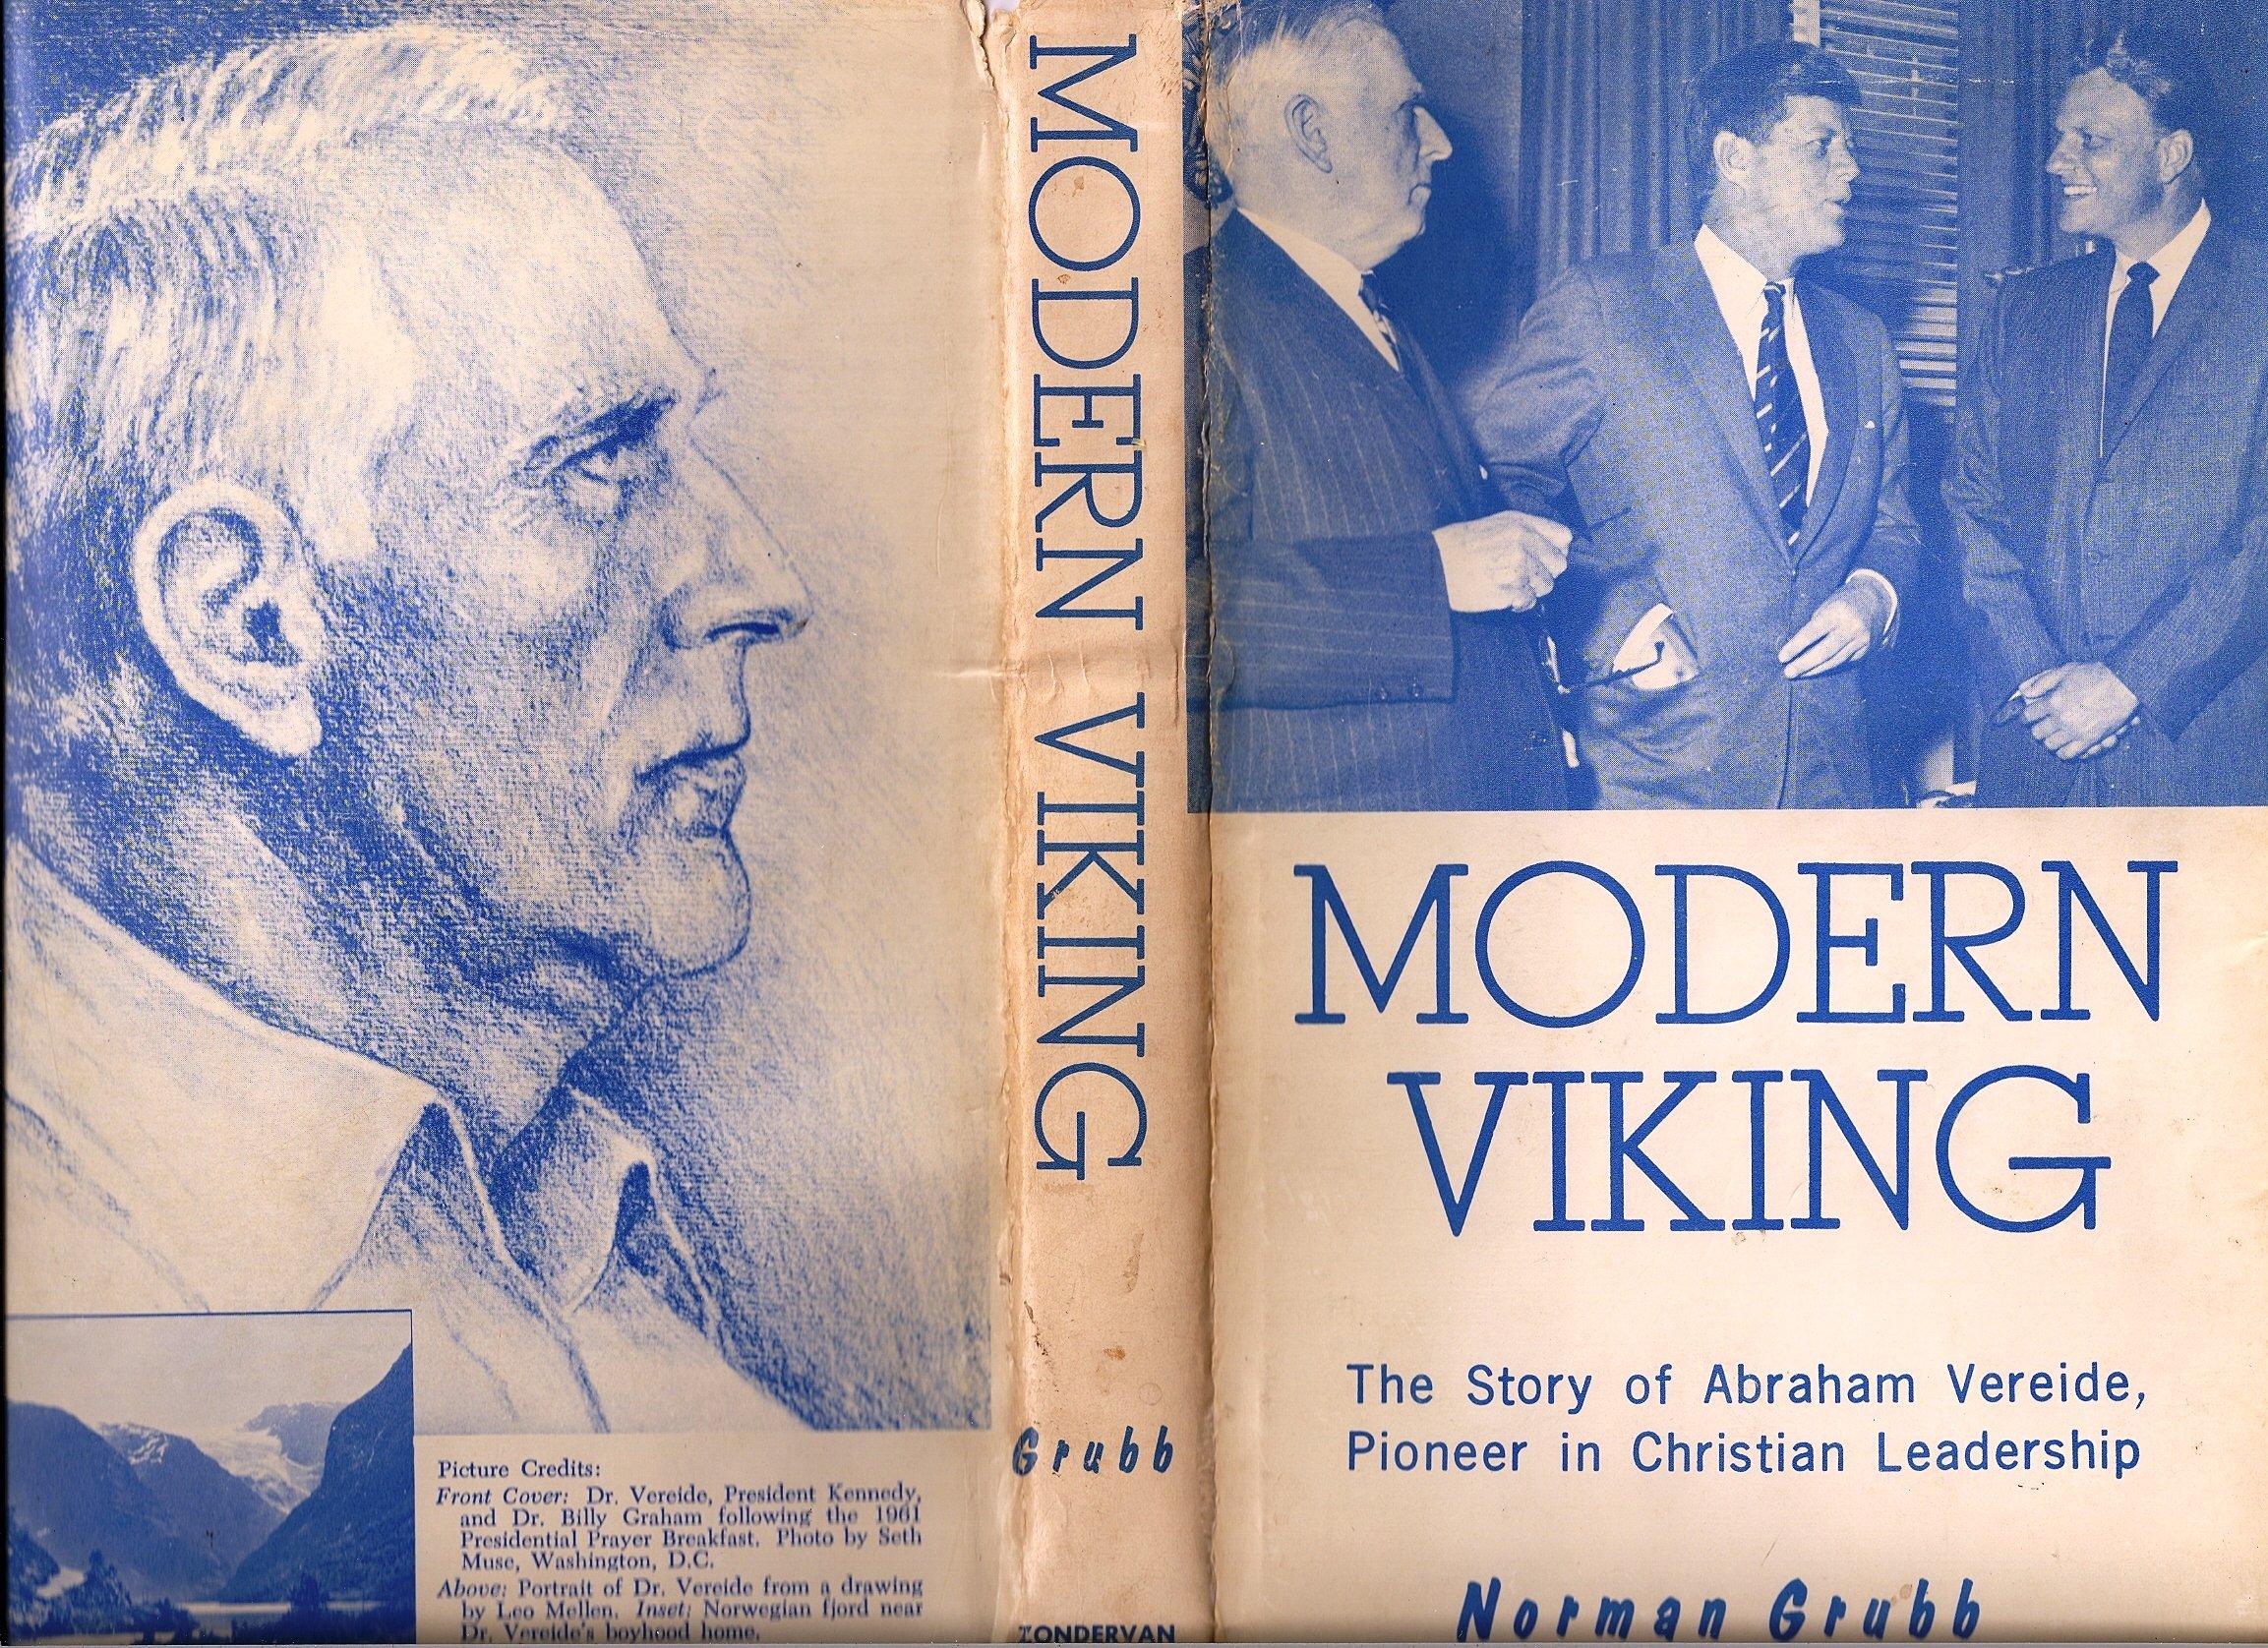 modern viking the story of abraham vereide pioneer in chritian